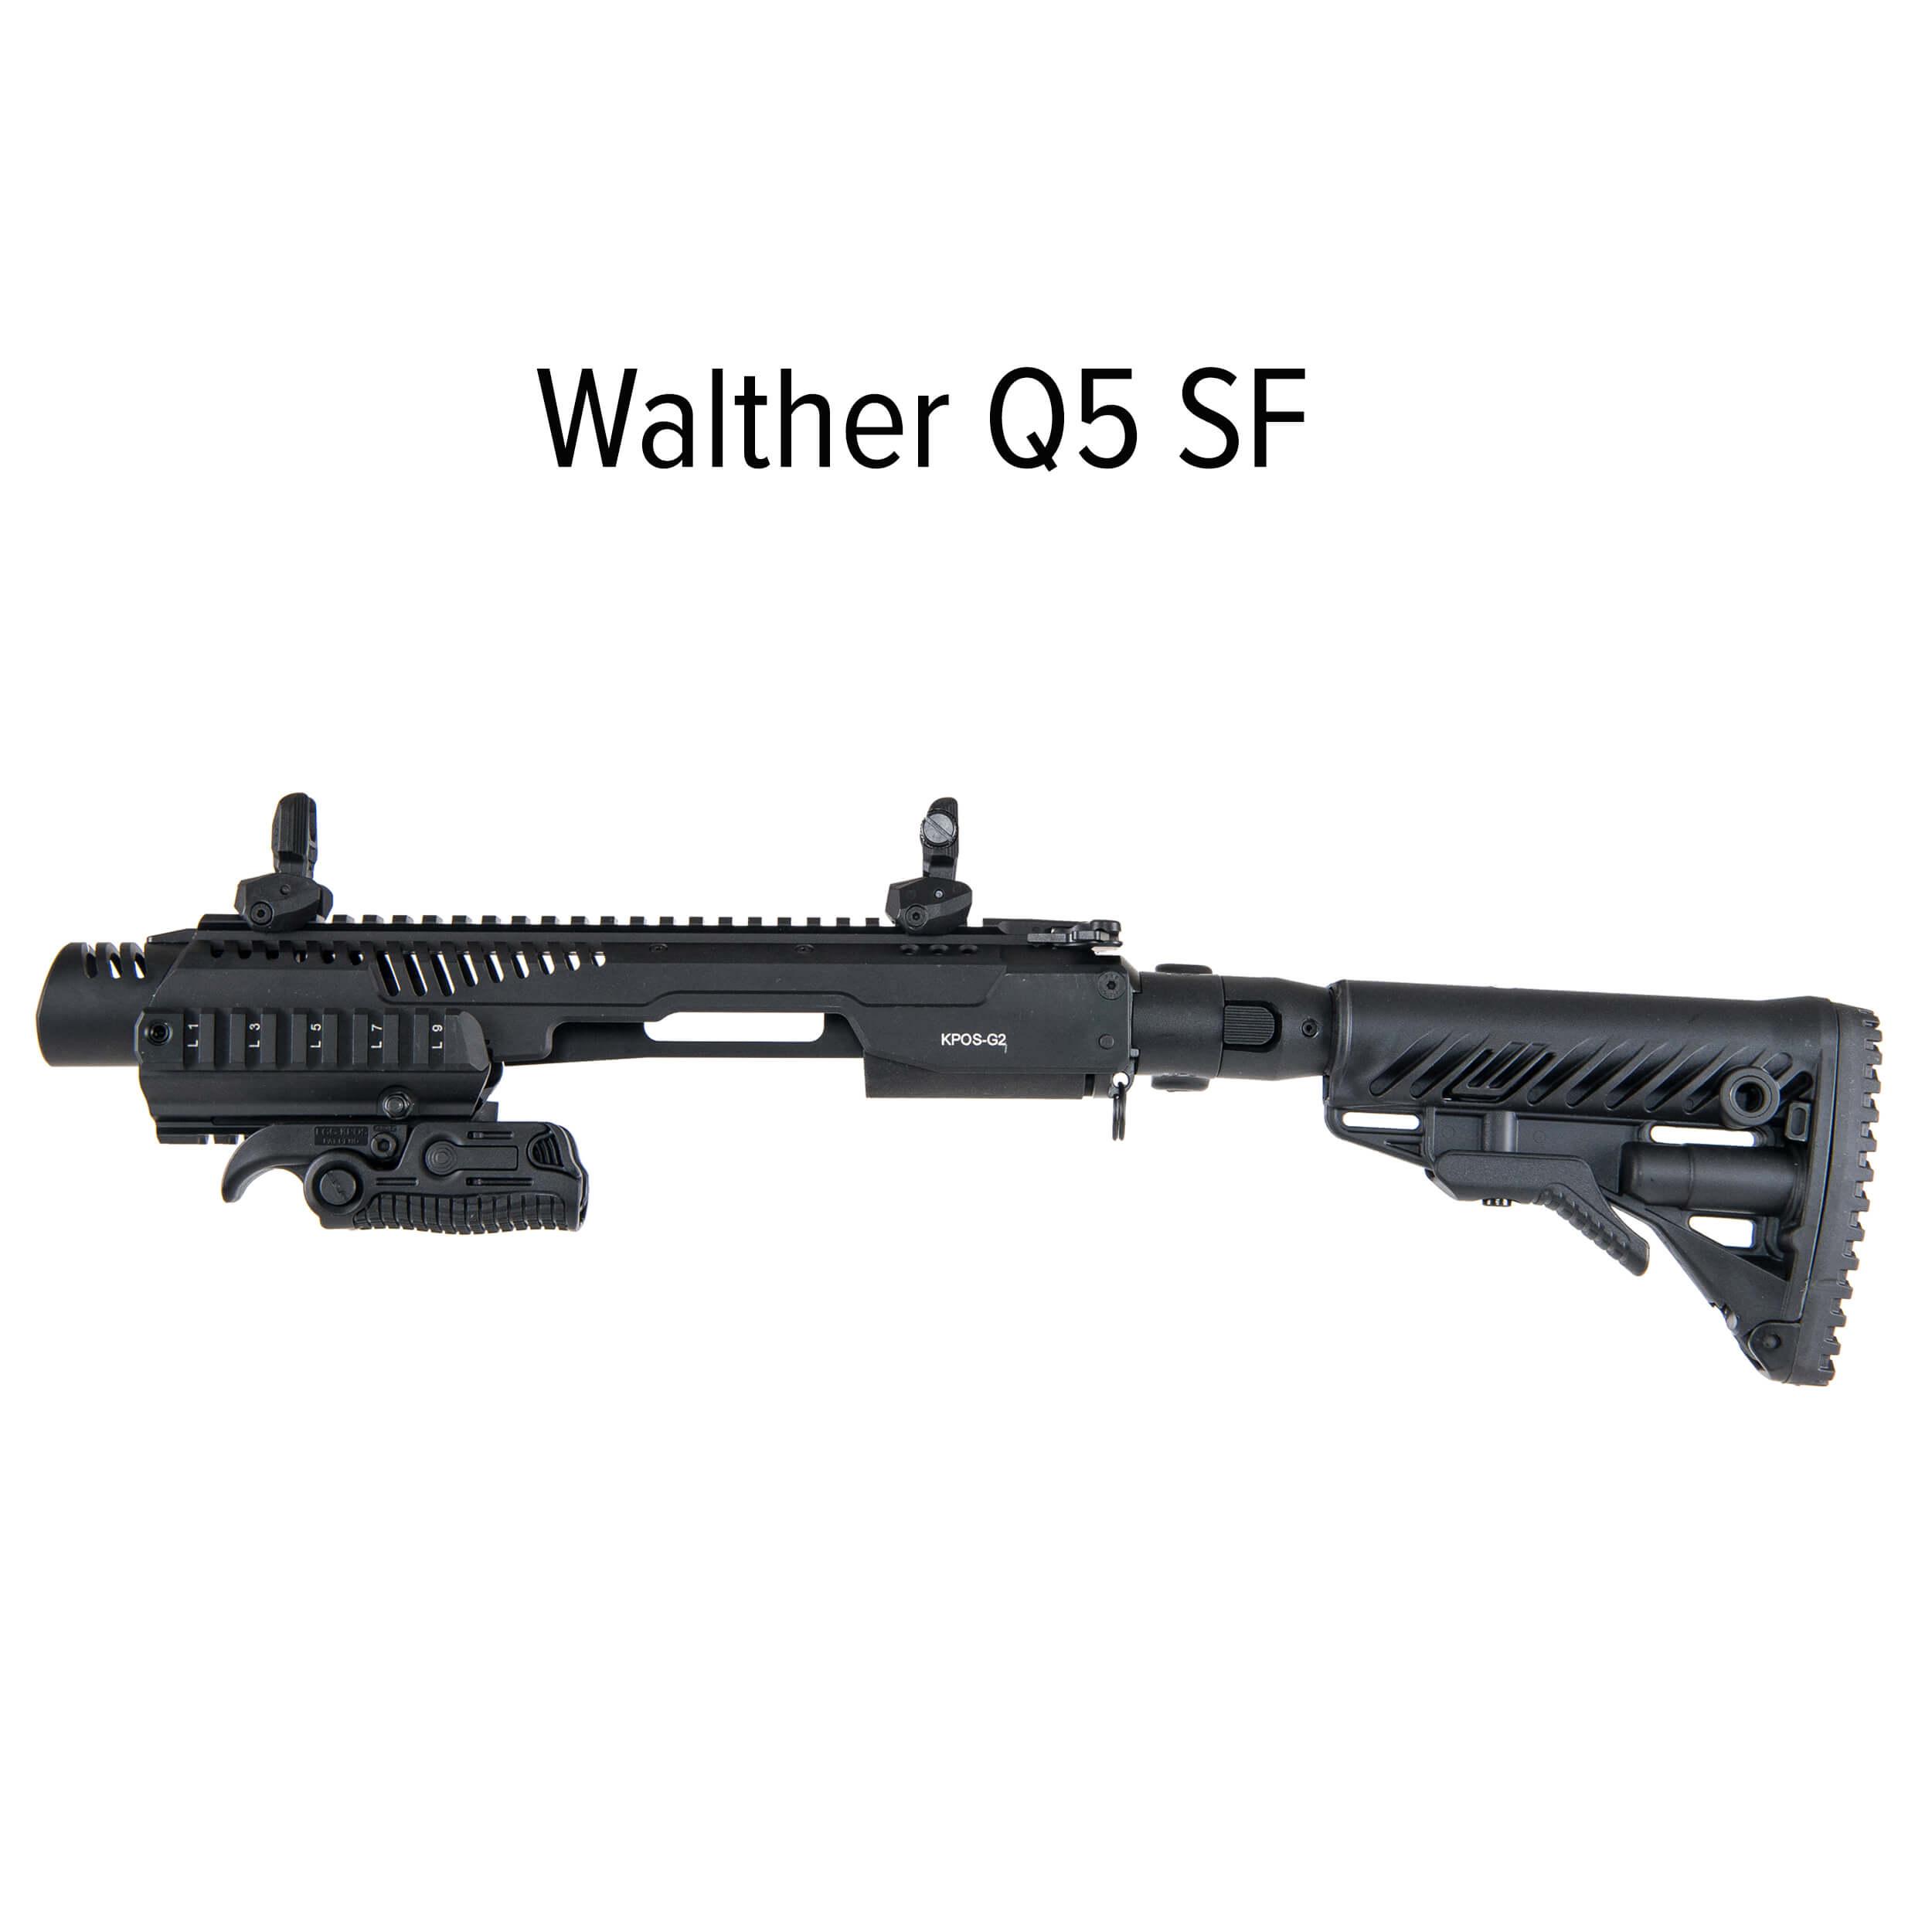 KPOS G2C Walther Q5 SF